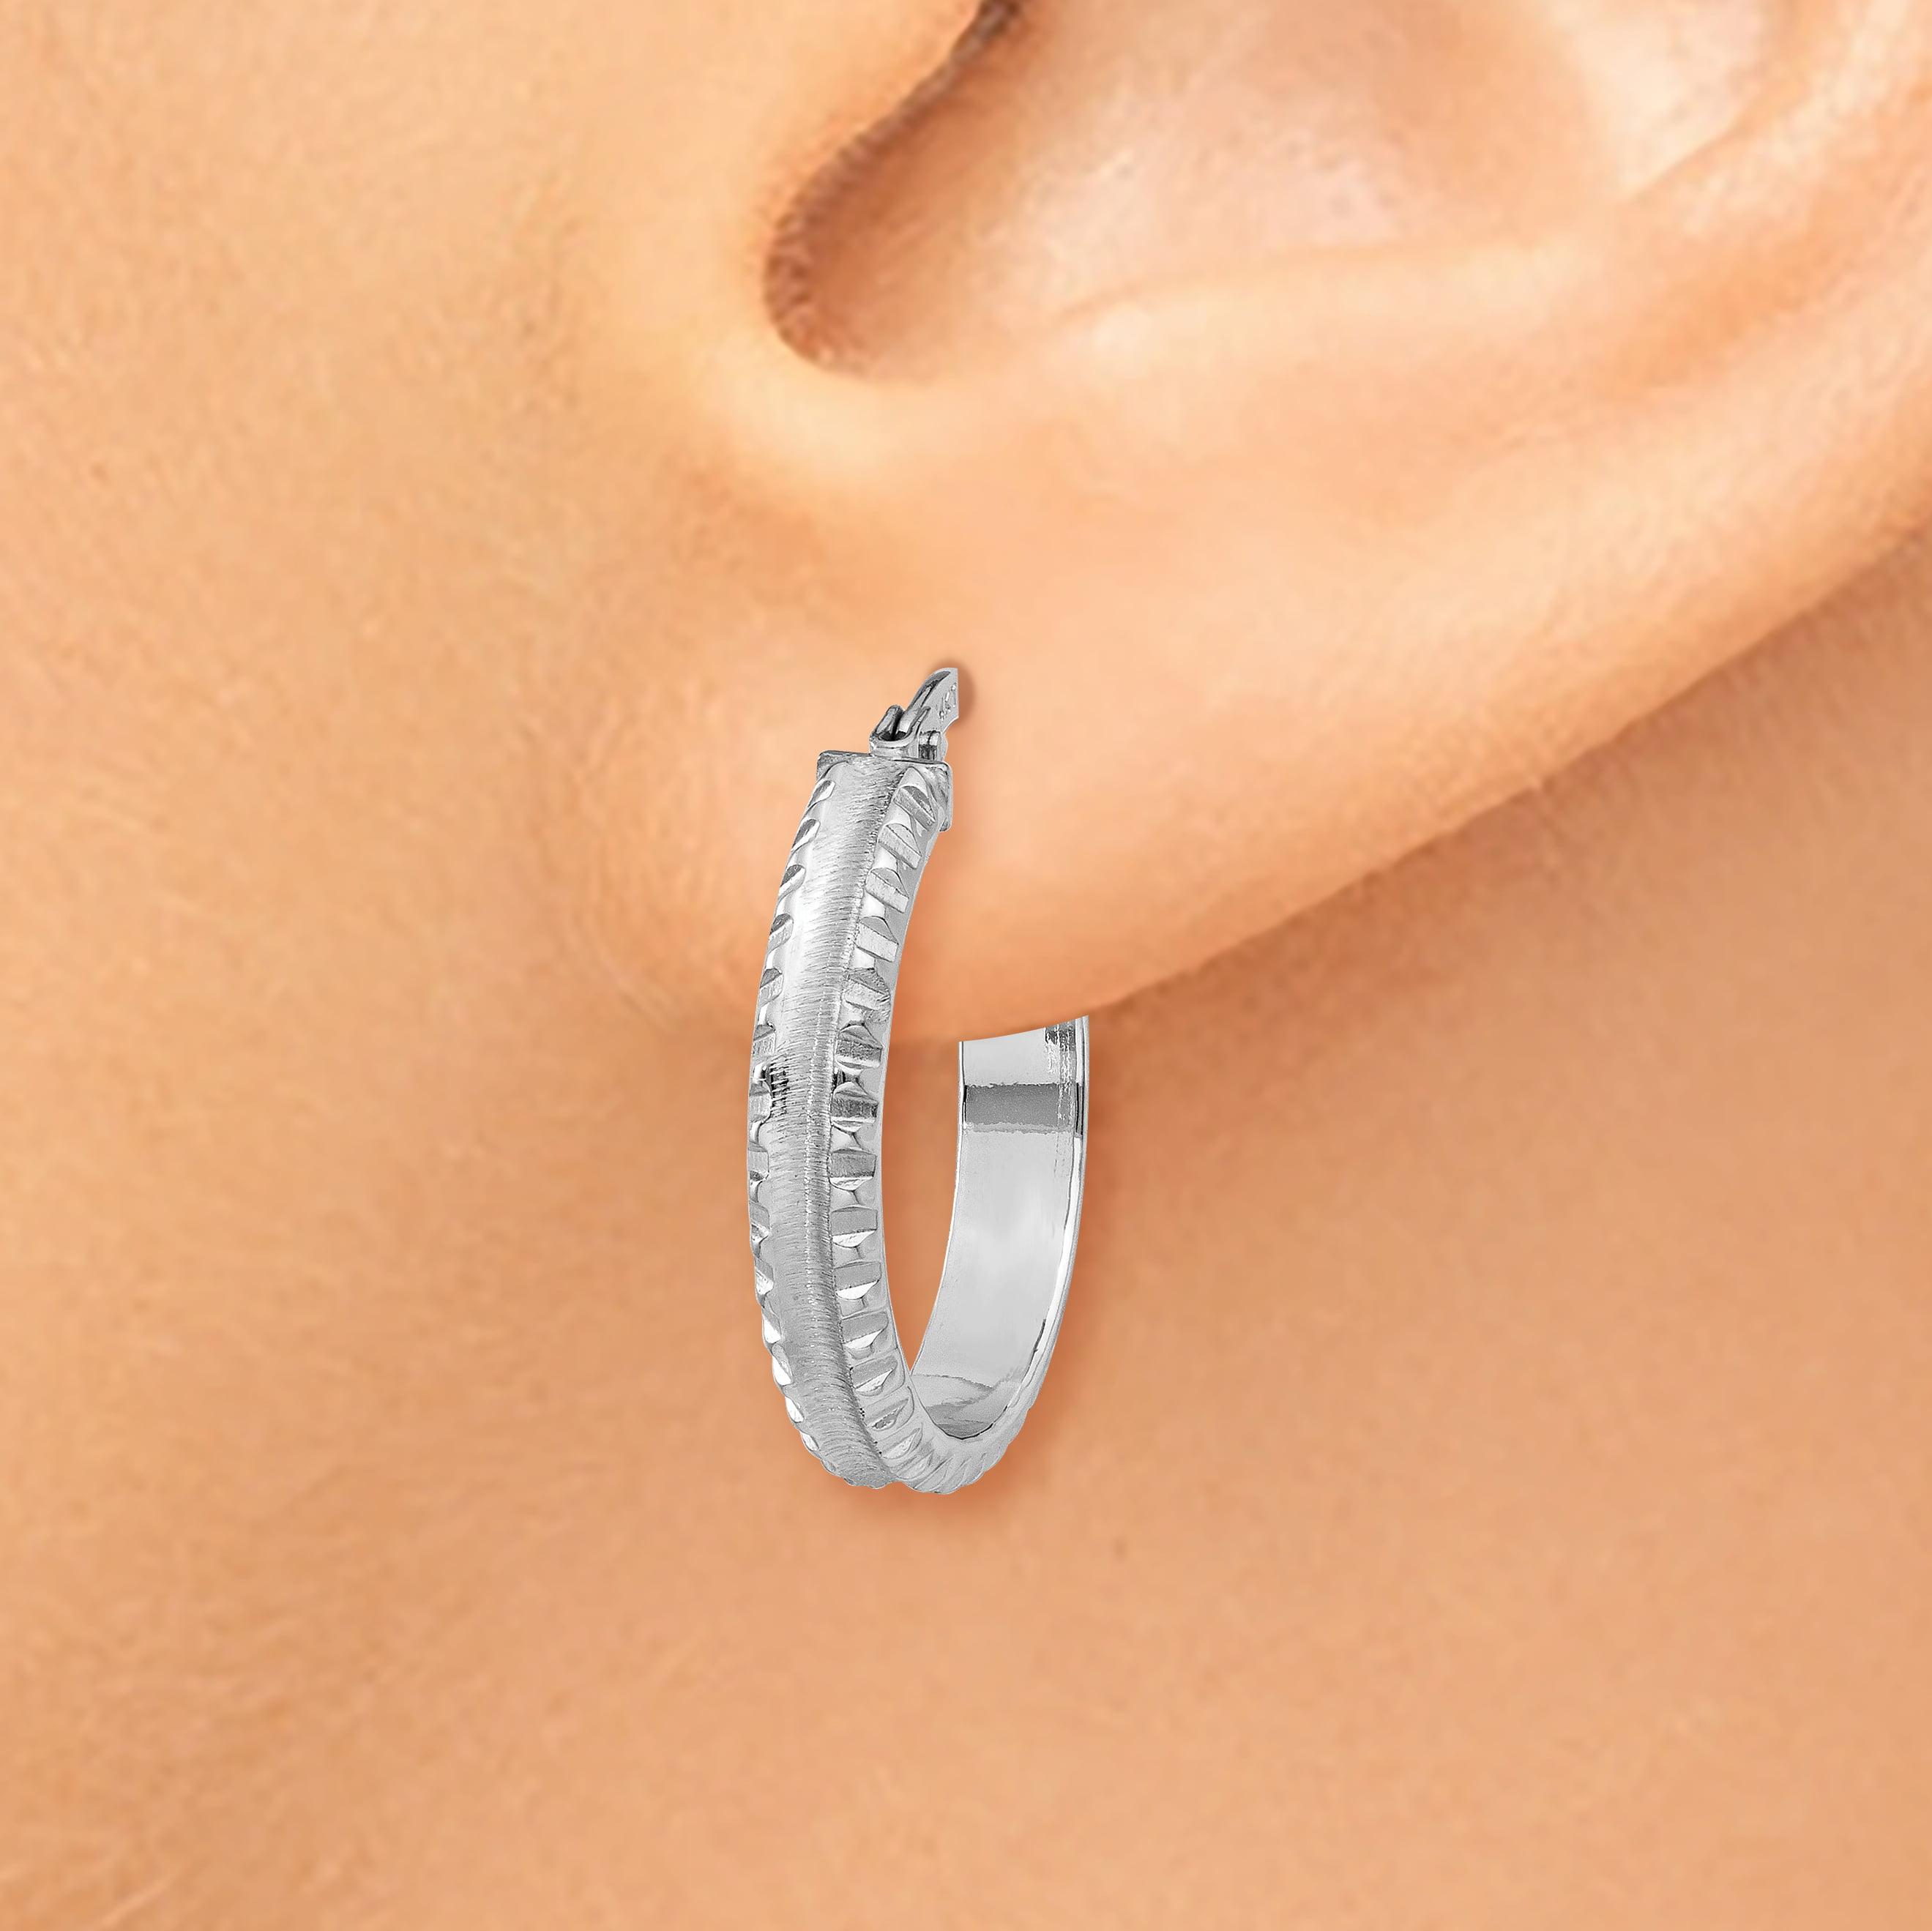 14K White Gold Polished/Satin Ridged Edge Concave Hoop Earrings - image 3 de 4